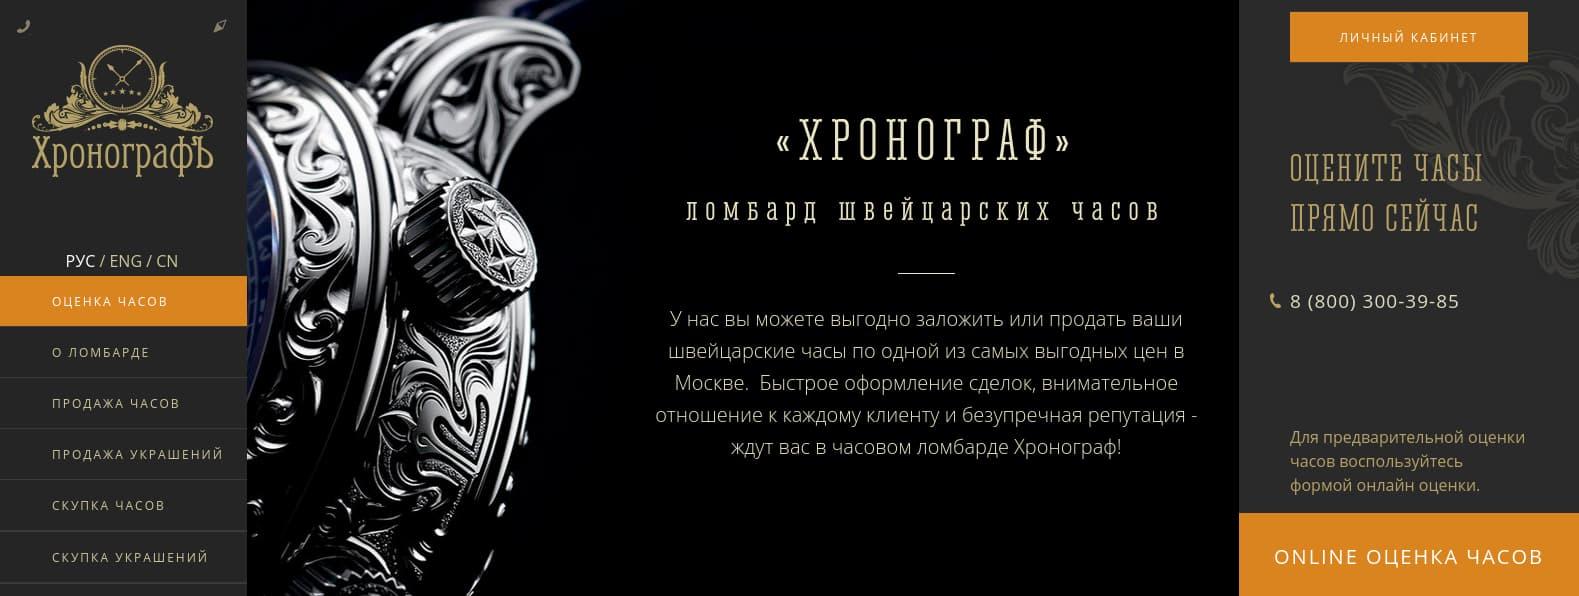 Image: caspwatch.ru